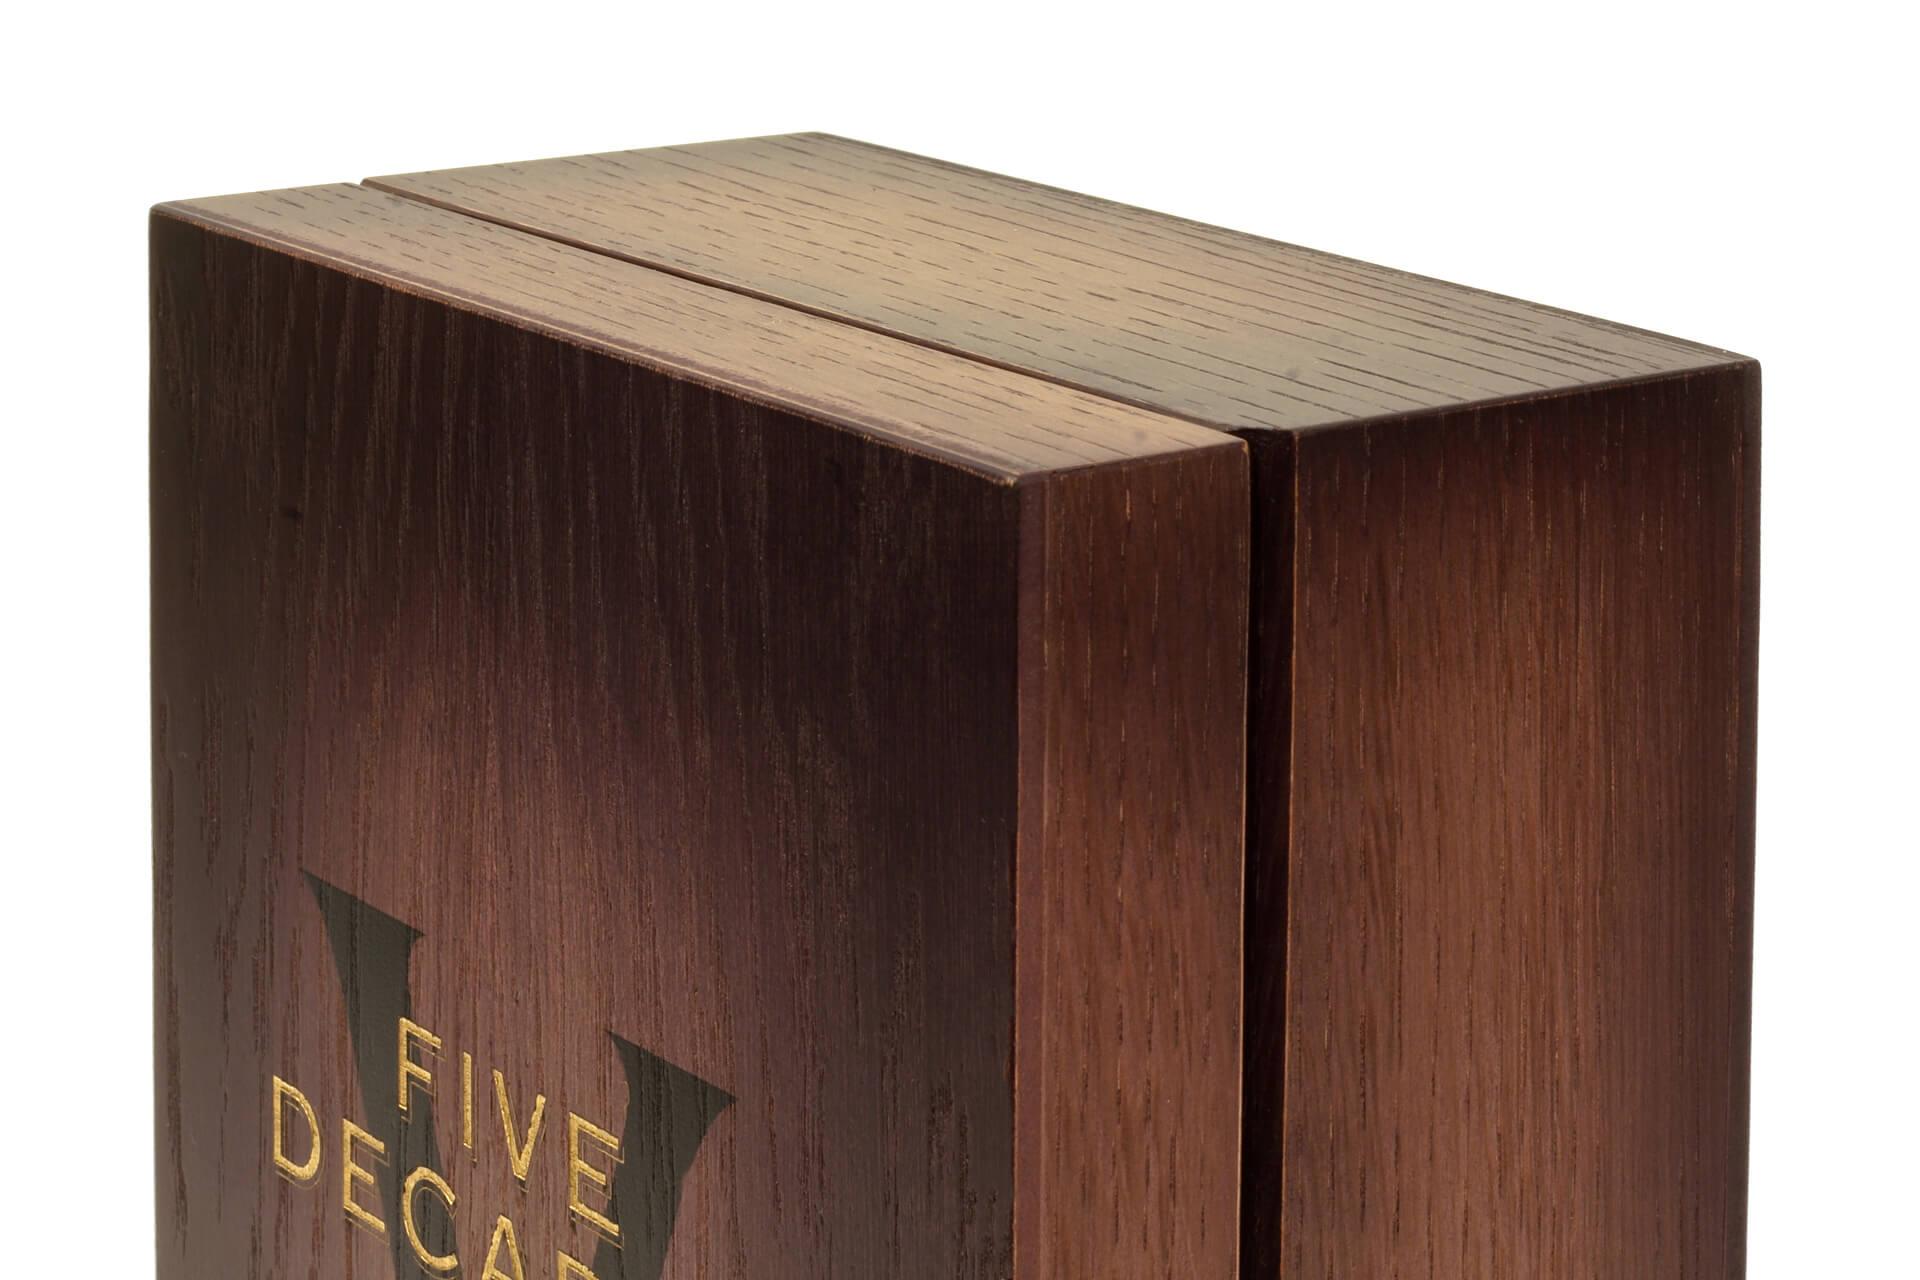 Unique Wooden Boxes For Tomintoul 5 Decades Moran S Moran S